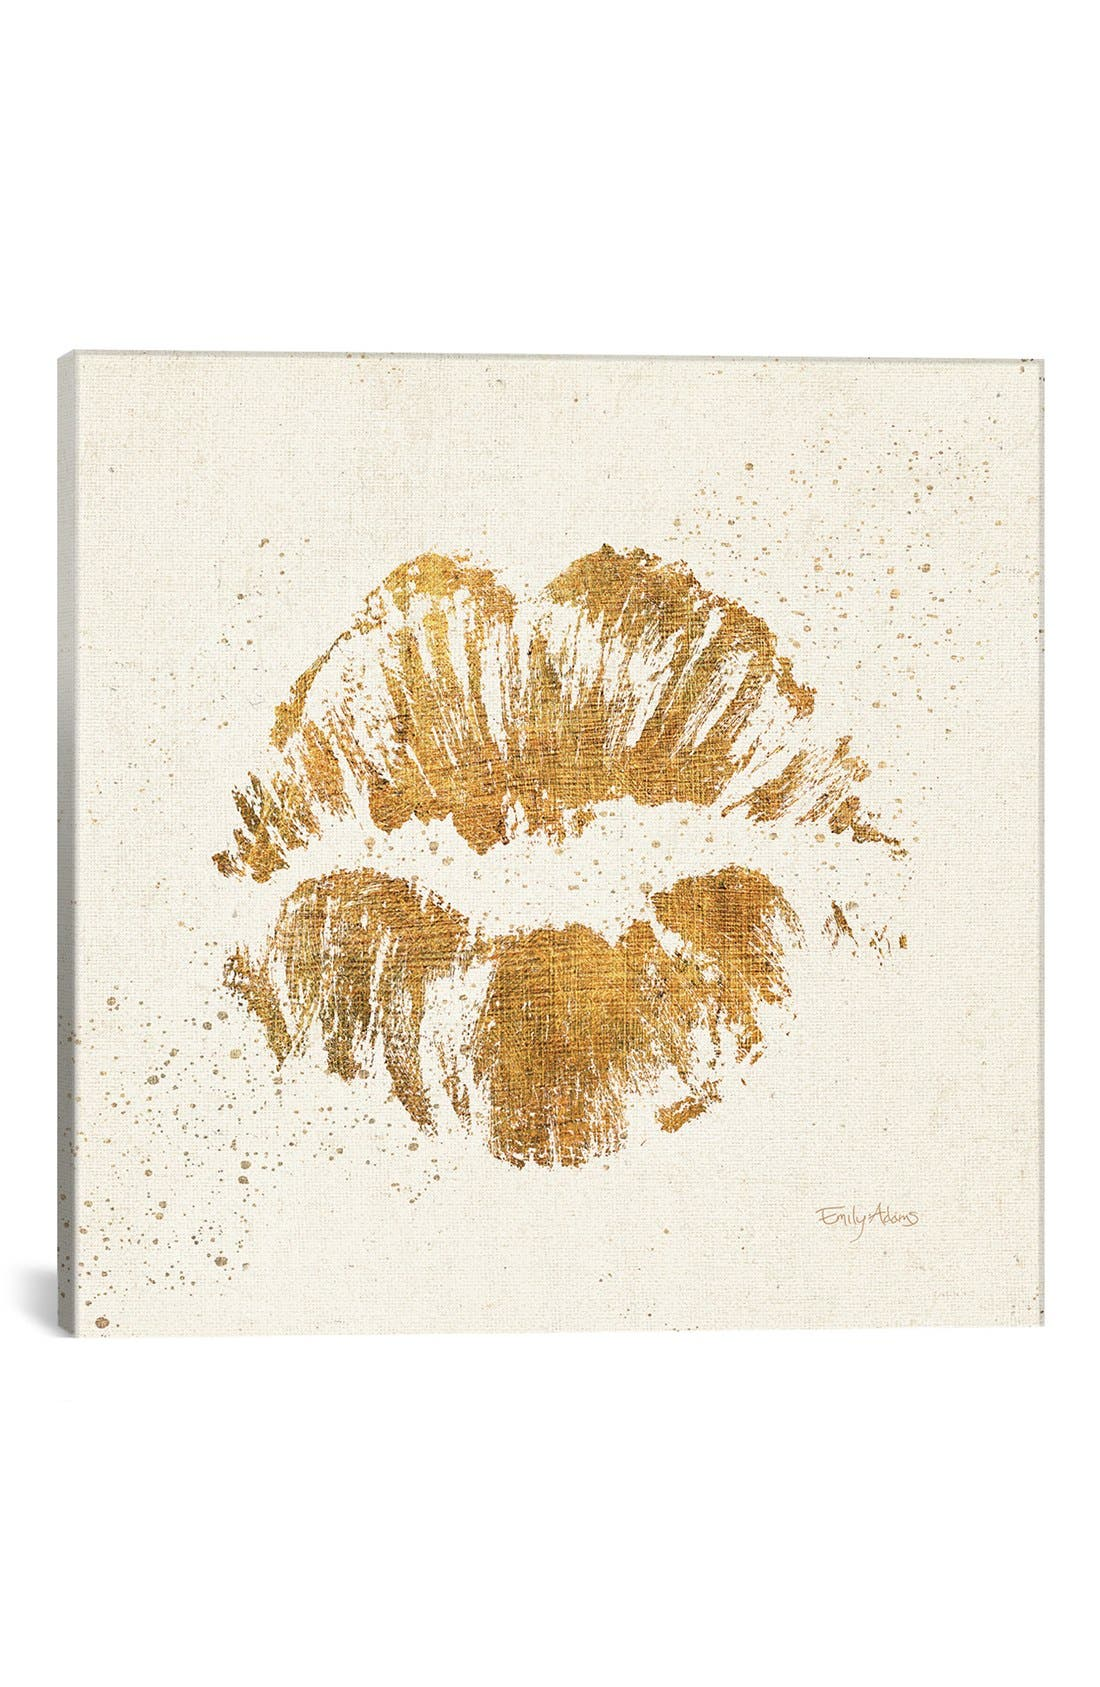 'Golden Lips' Giclée Print Canvas Art,                             Main thumbnail 1, color,